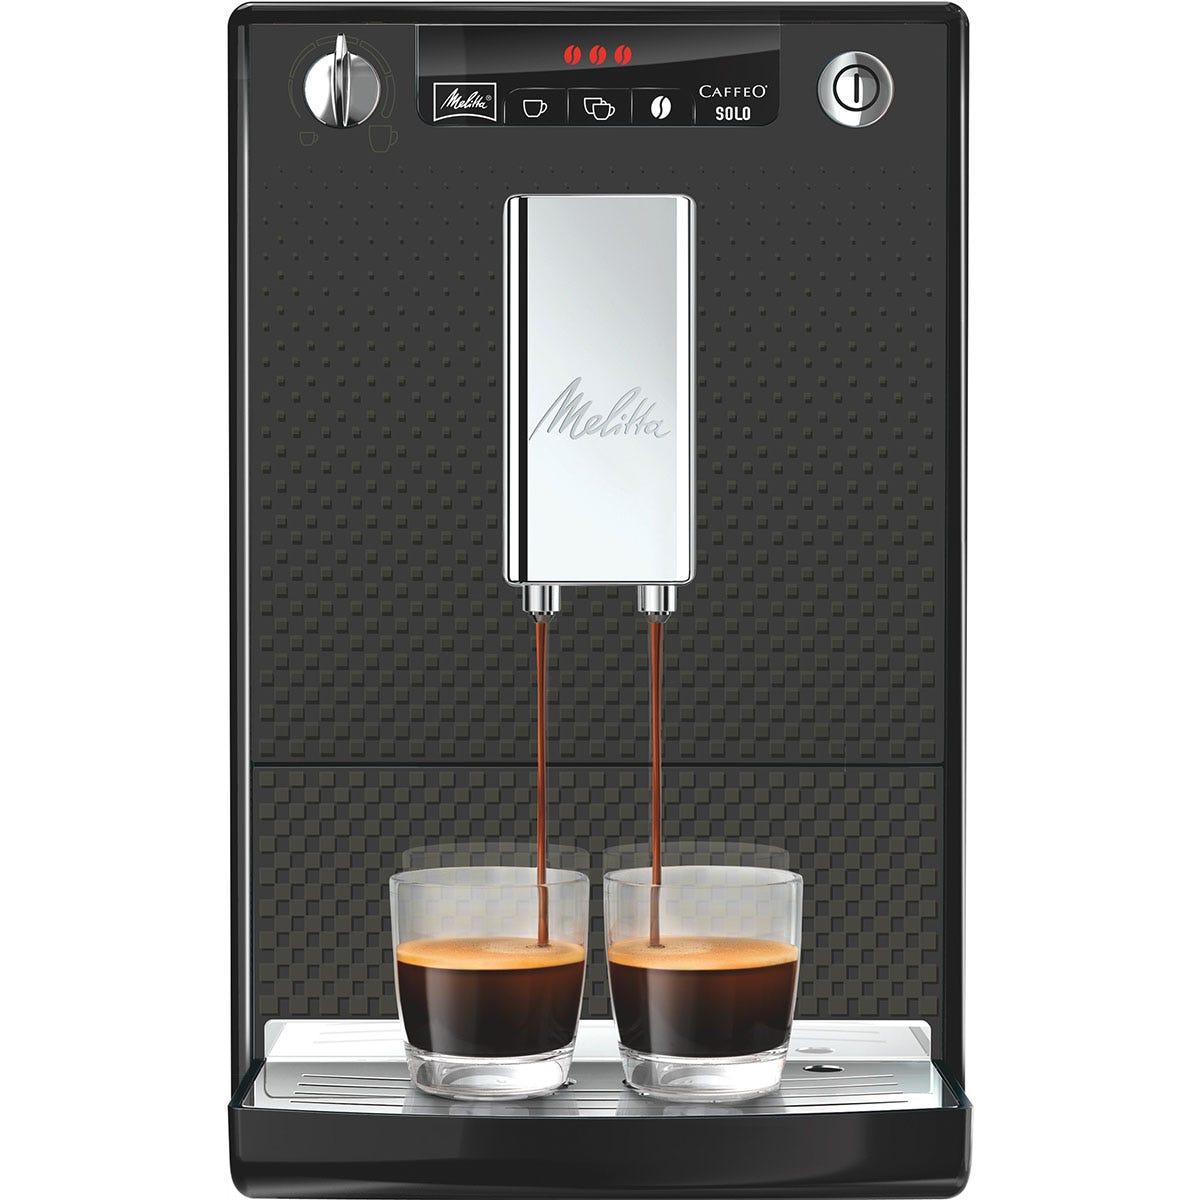 Melitta 6708696 Caffeo Solo Full Automatic Bean to Cup Coffee Machine - Black